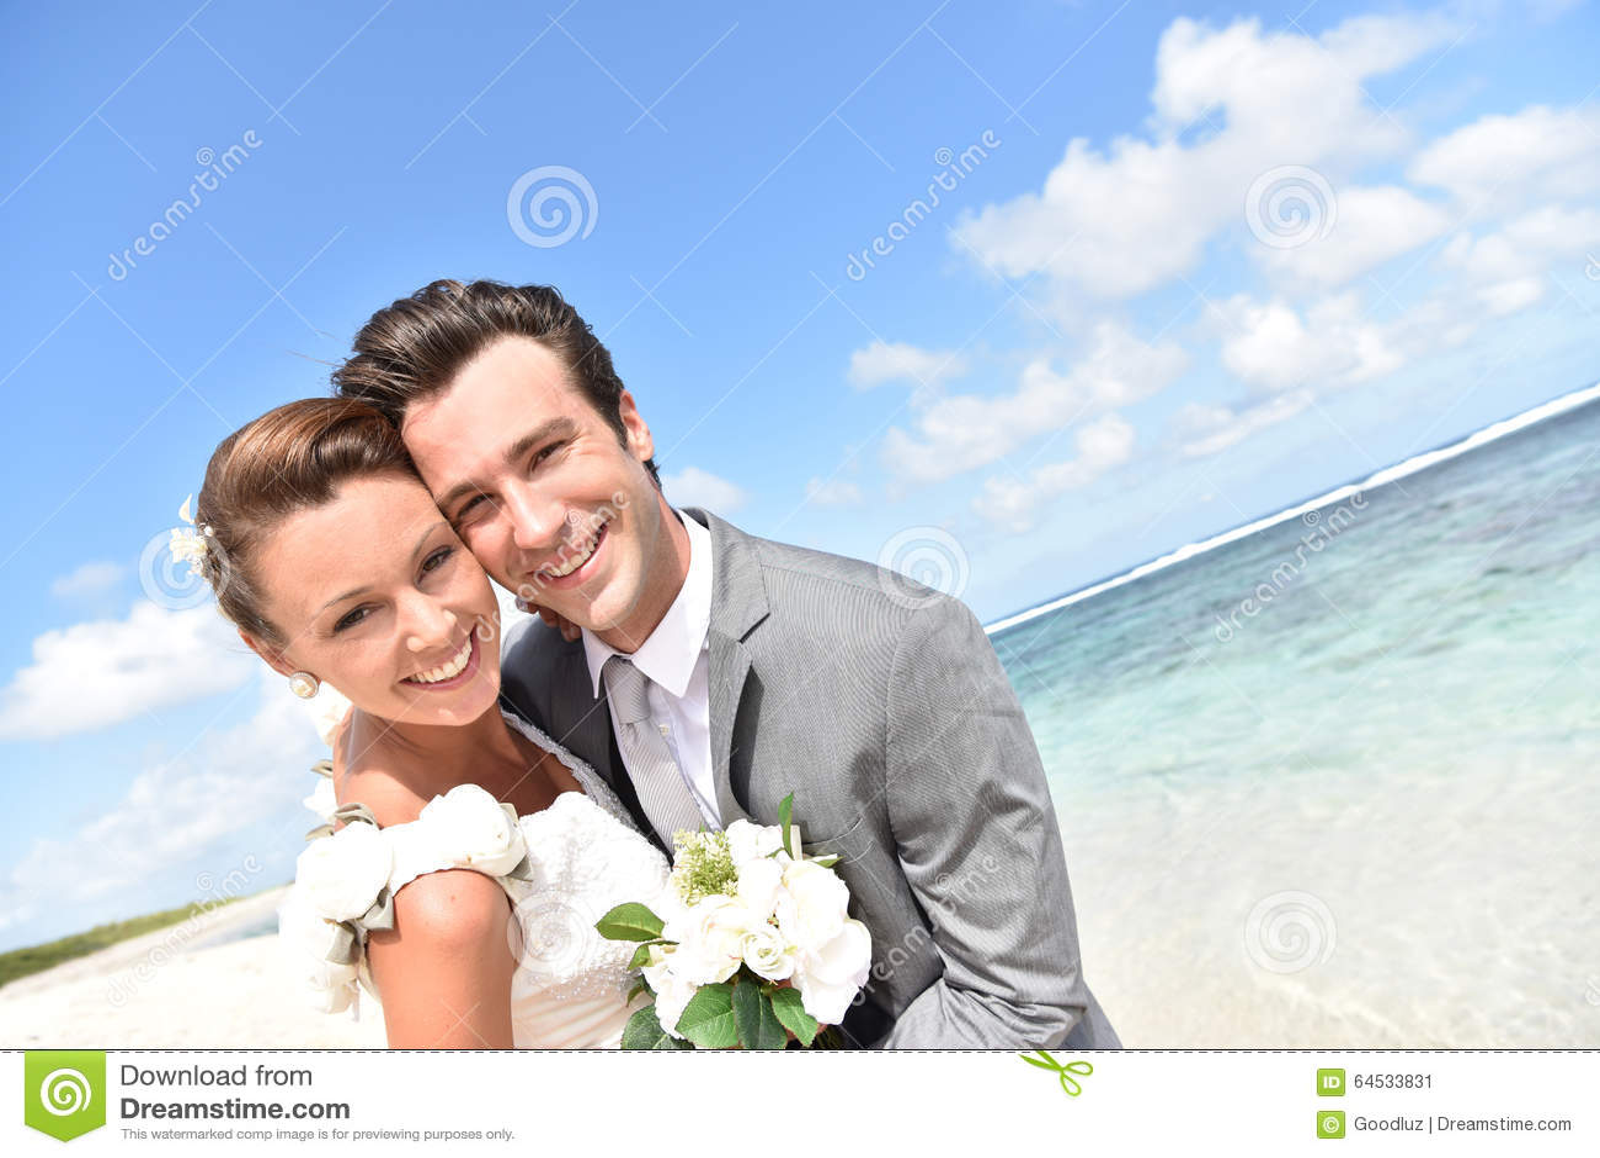 Portrait of freshly married couple on caribbean beach